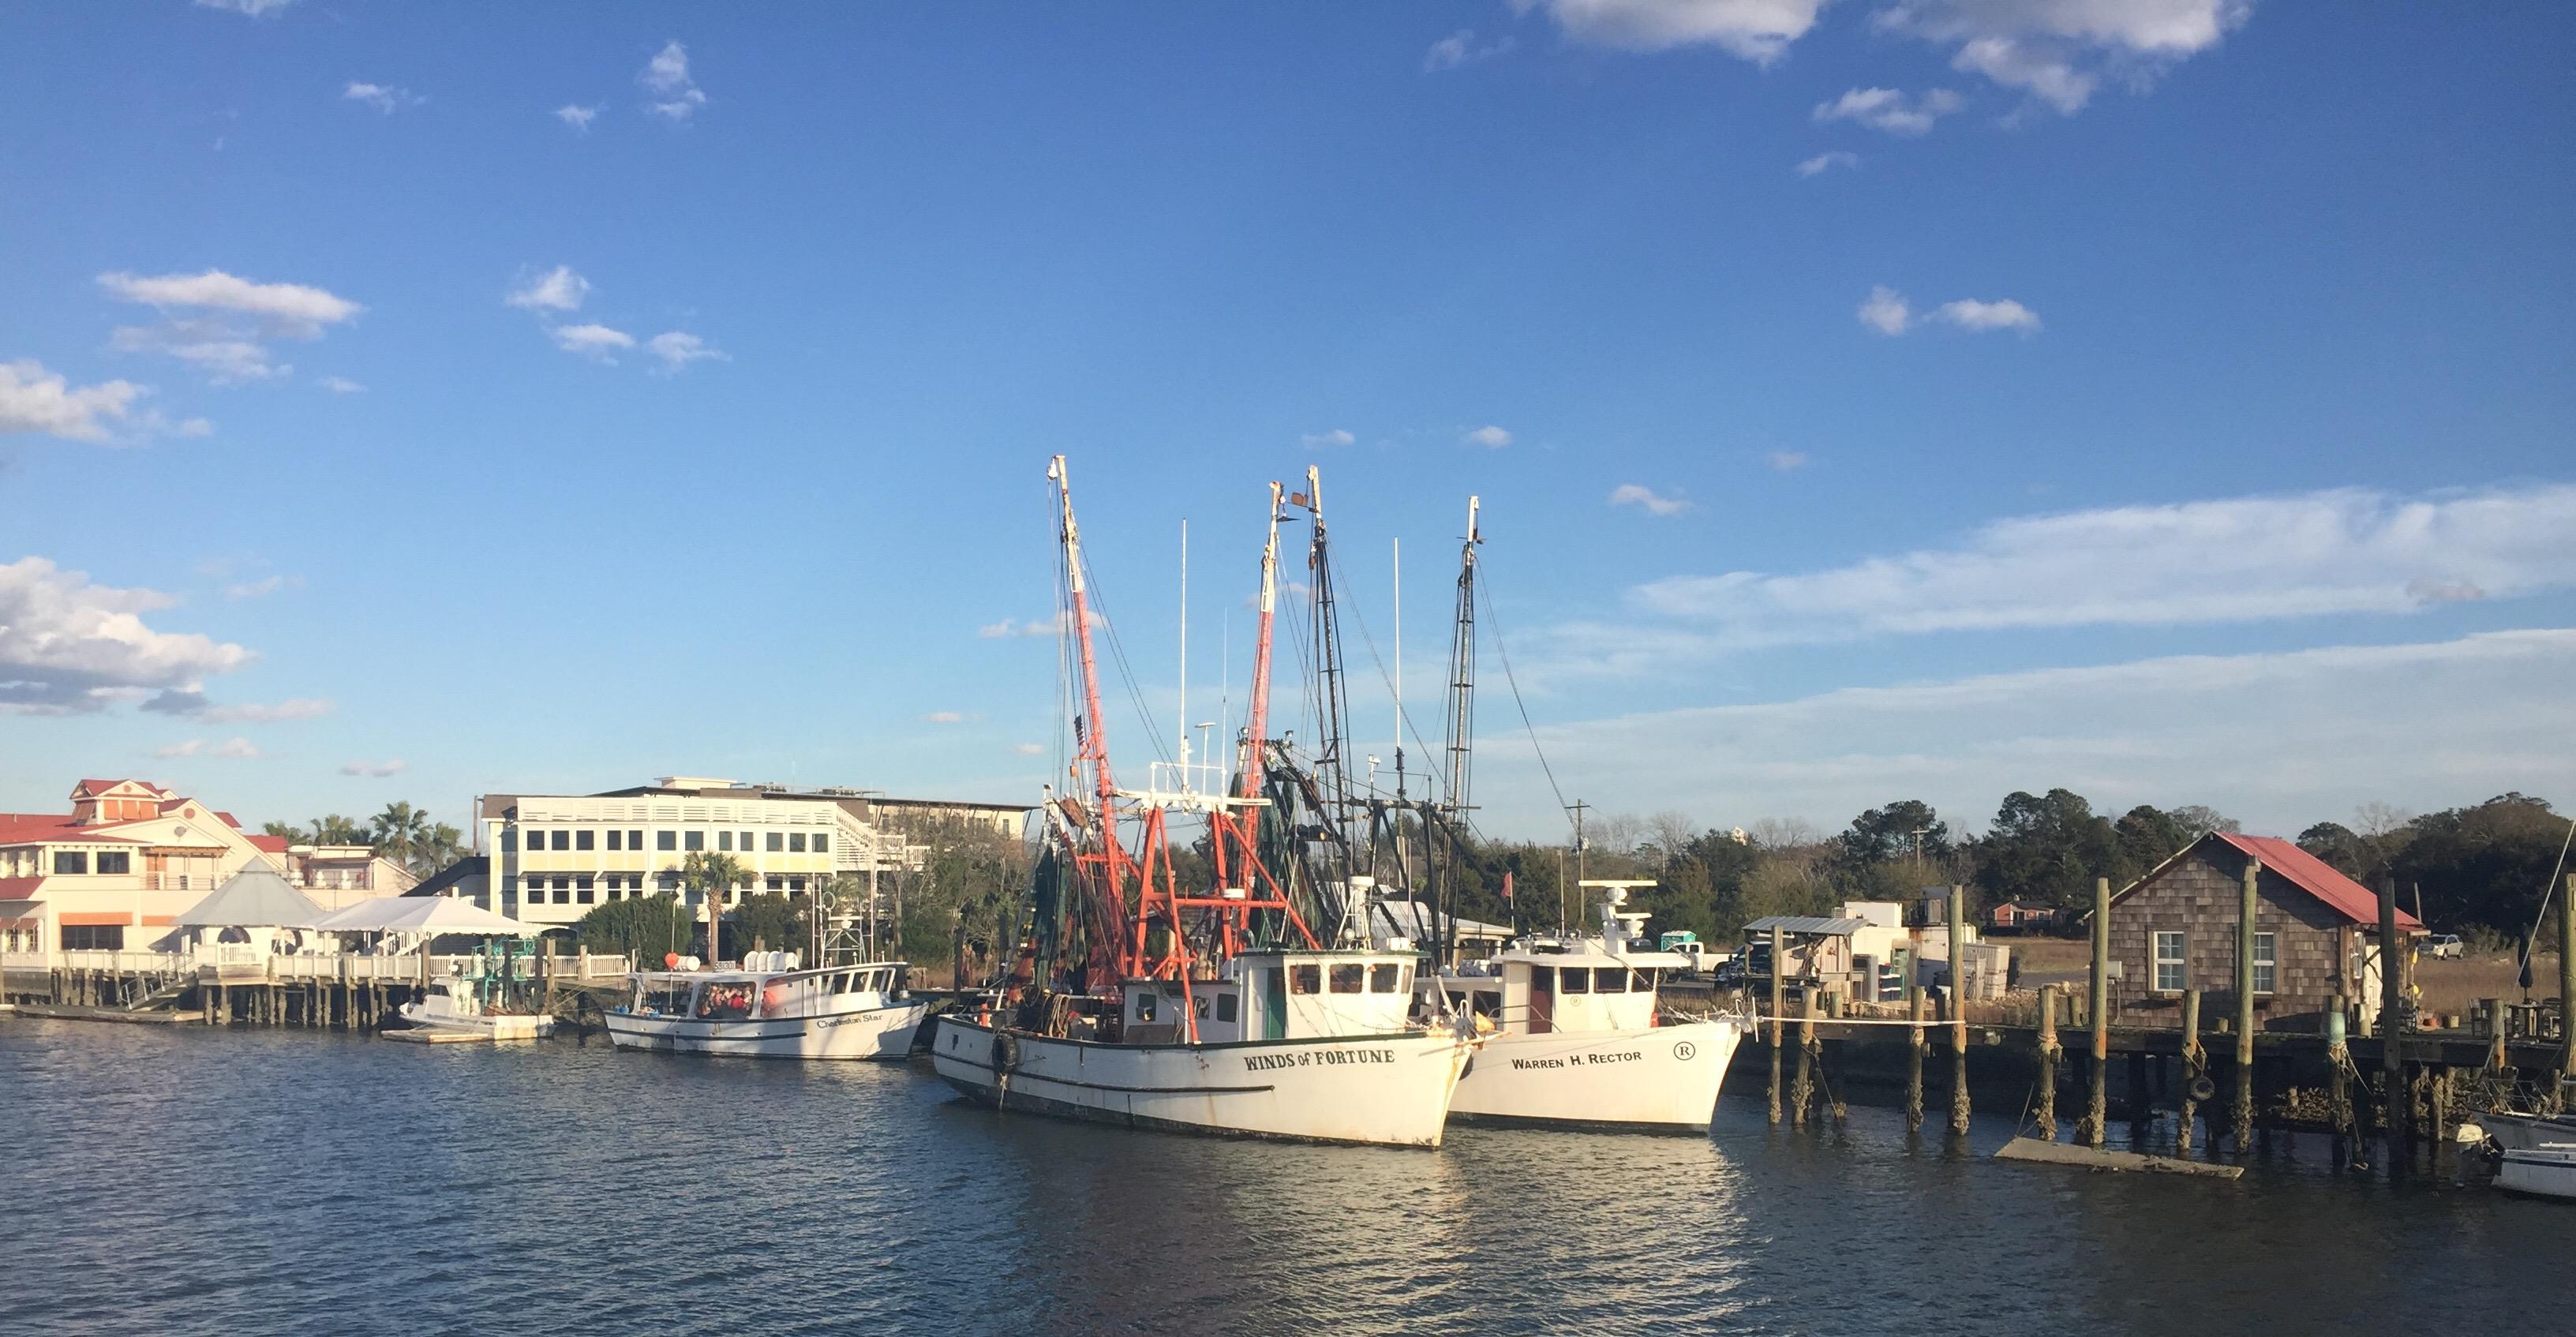 Shem Creel Shrimp Boats